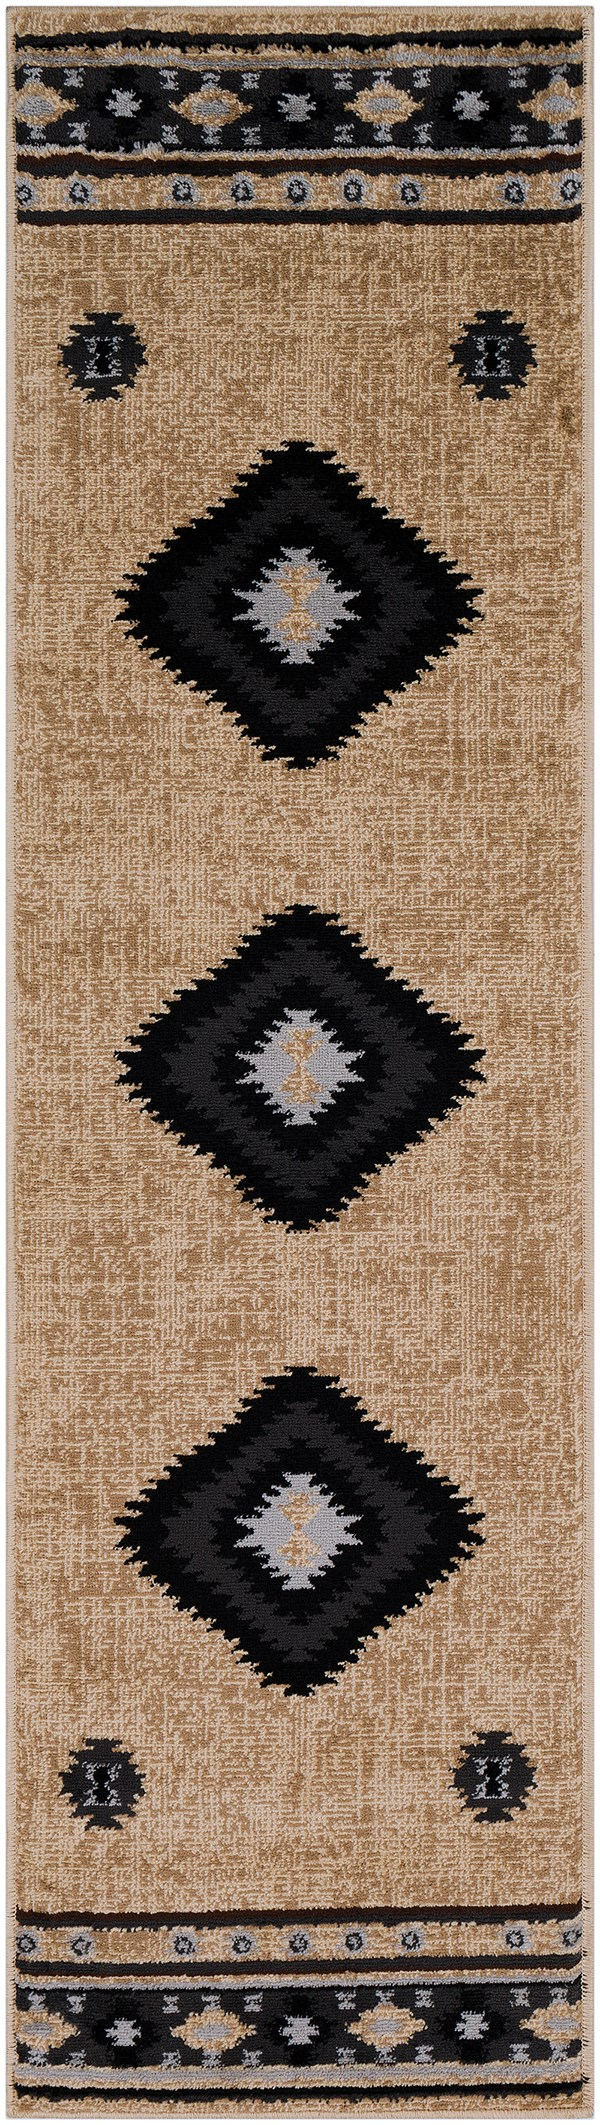 Black, Charcoal, Medium Gray  Southwestern / Lodge Area Rug